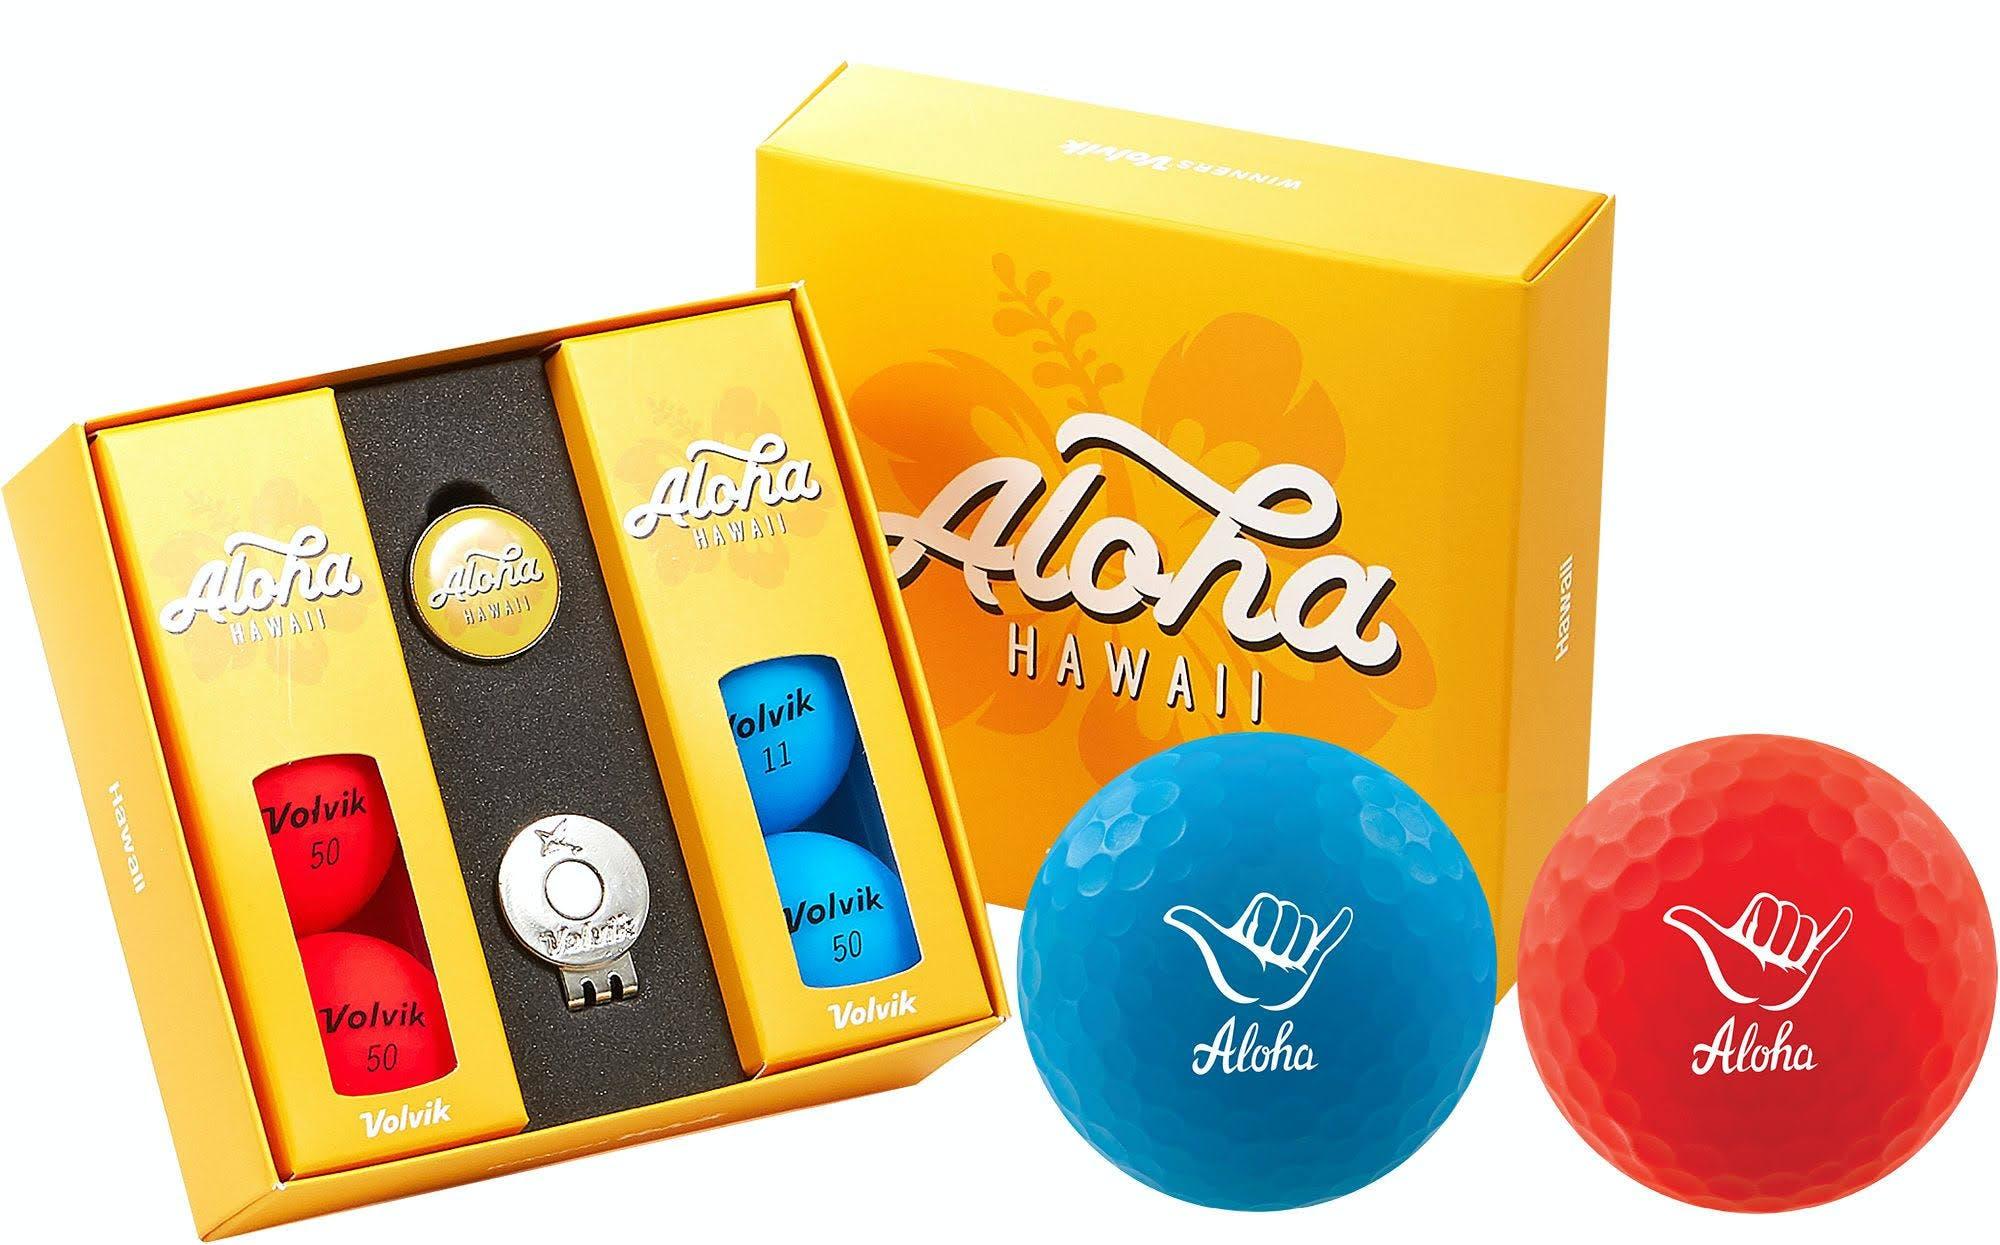 Volvik Vivid Matte State Hawaii Edition Golf Balls + Hat Clip Set 6 Pack, Blue